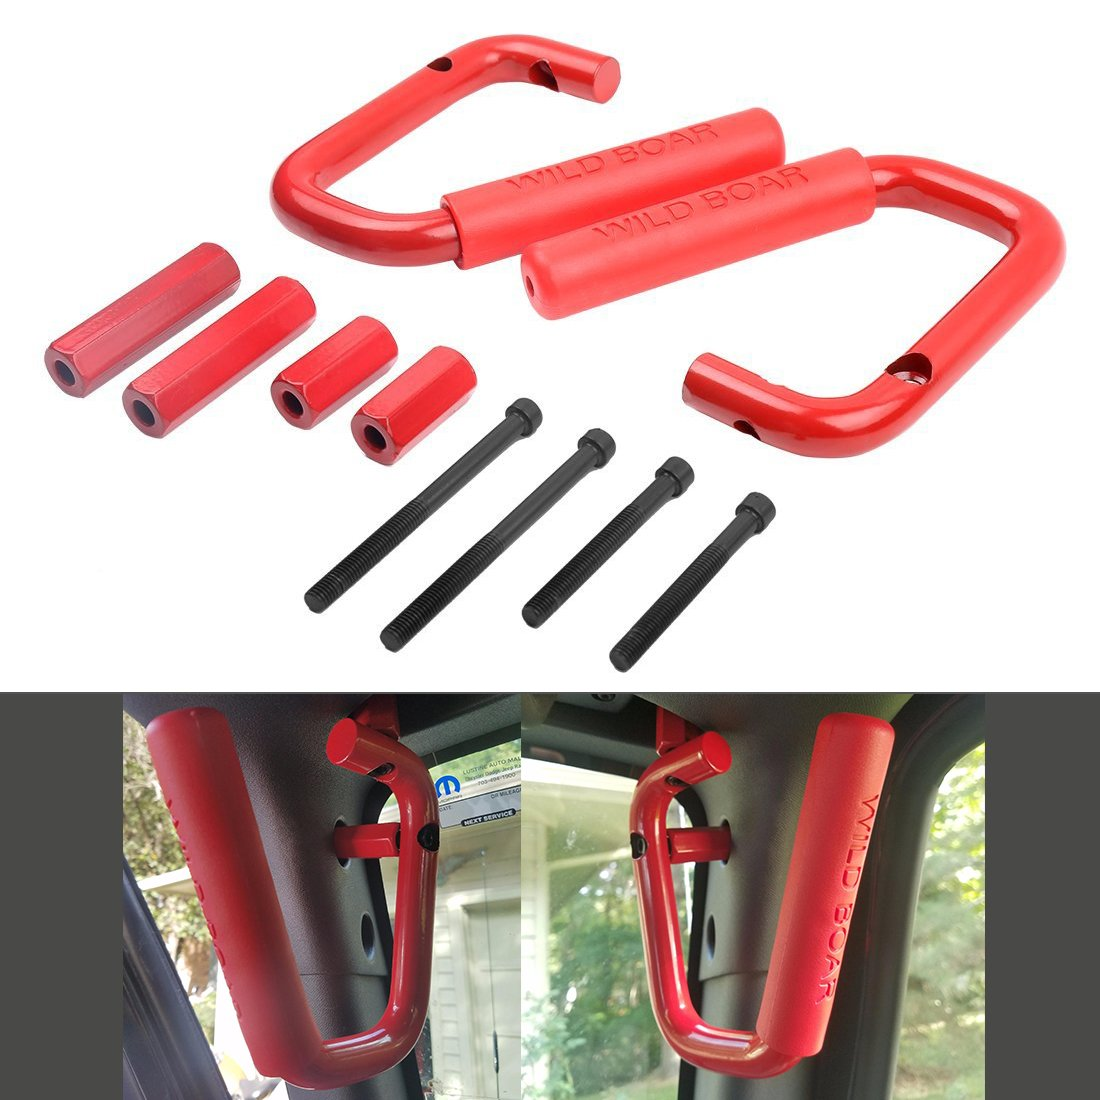 Black Solid Steel Rear Grab Handles Interior Side Grab Handle Bar for Jeep Wrangler Jk Rubicon Sahara Sport 2/4 Door 2007-2015 2Pcs SUPAREE JP015